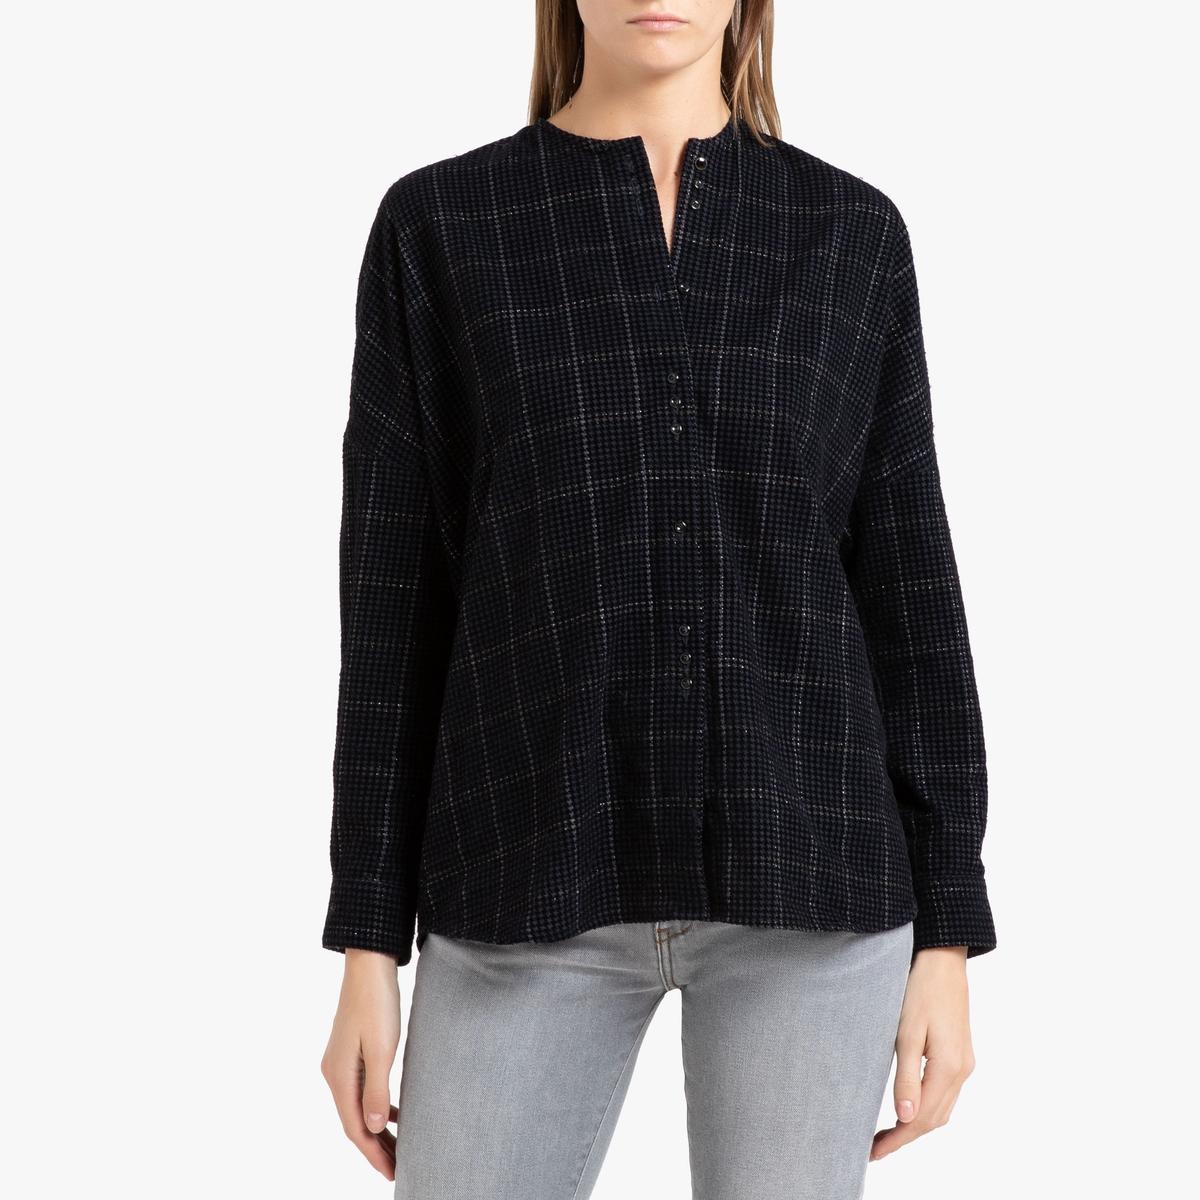 Рубашка La Redoute С длинными рукавами CATALINA M синий цены онлайн